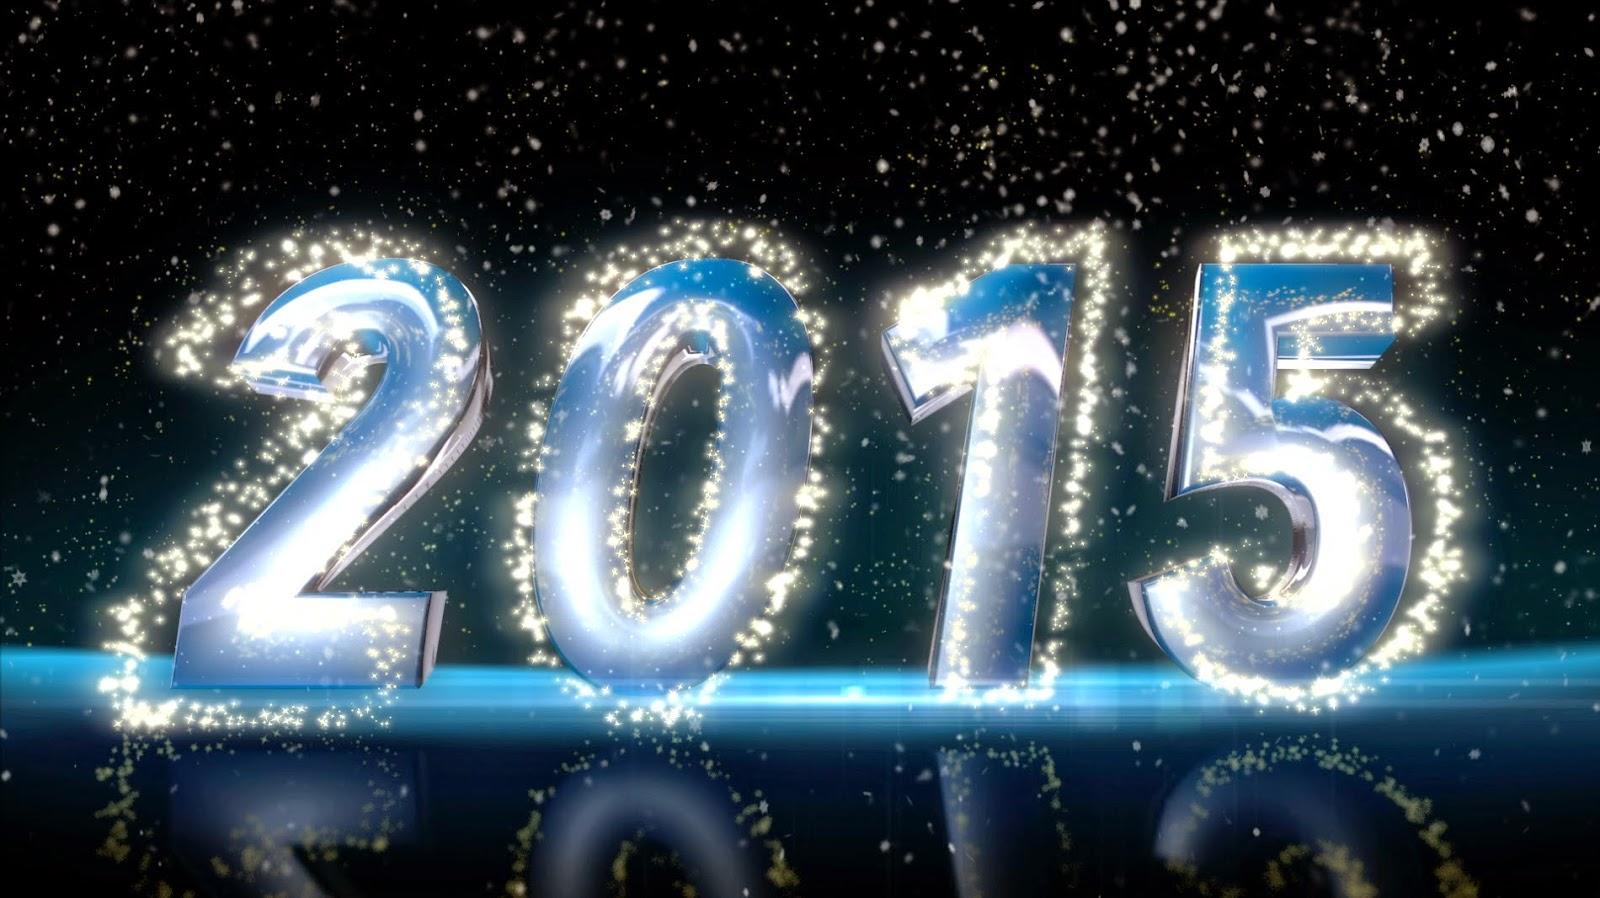 Happy New Year Greetings 2015